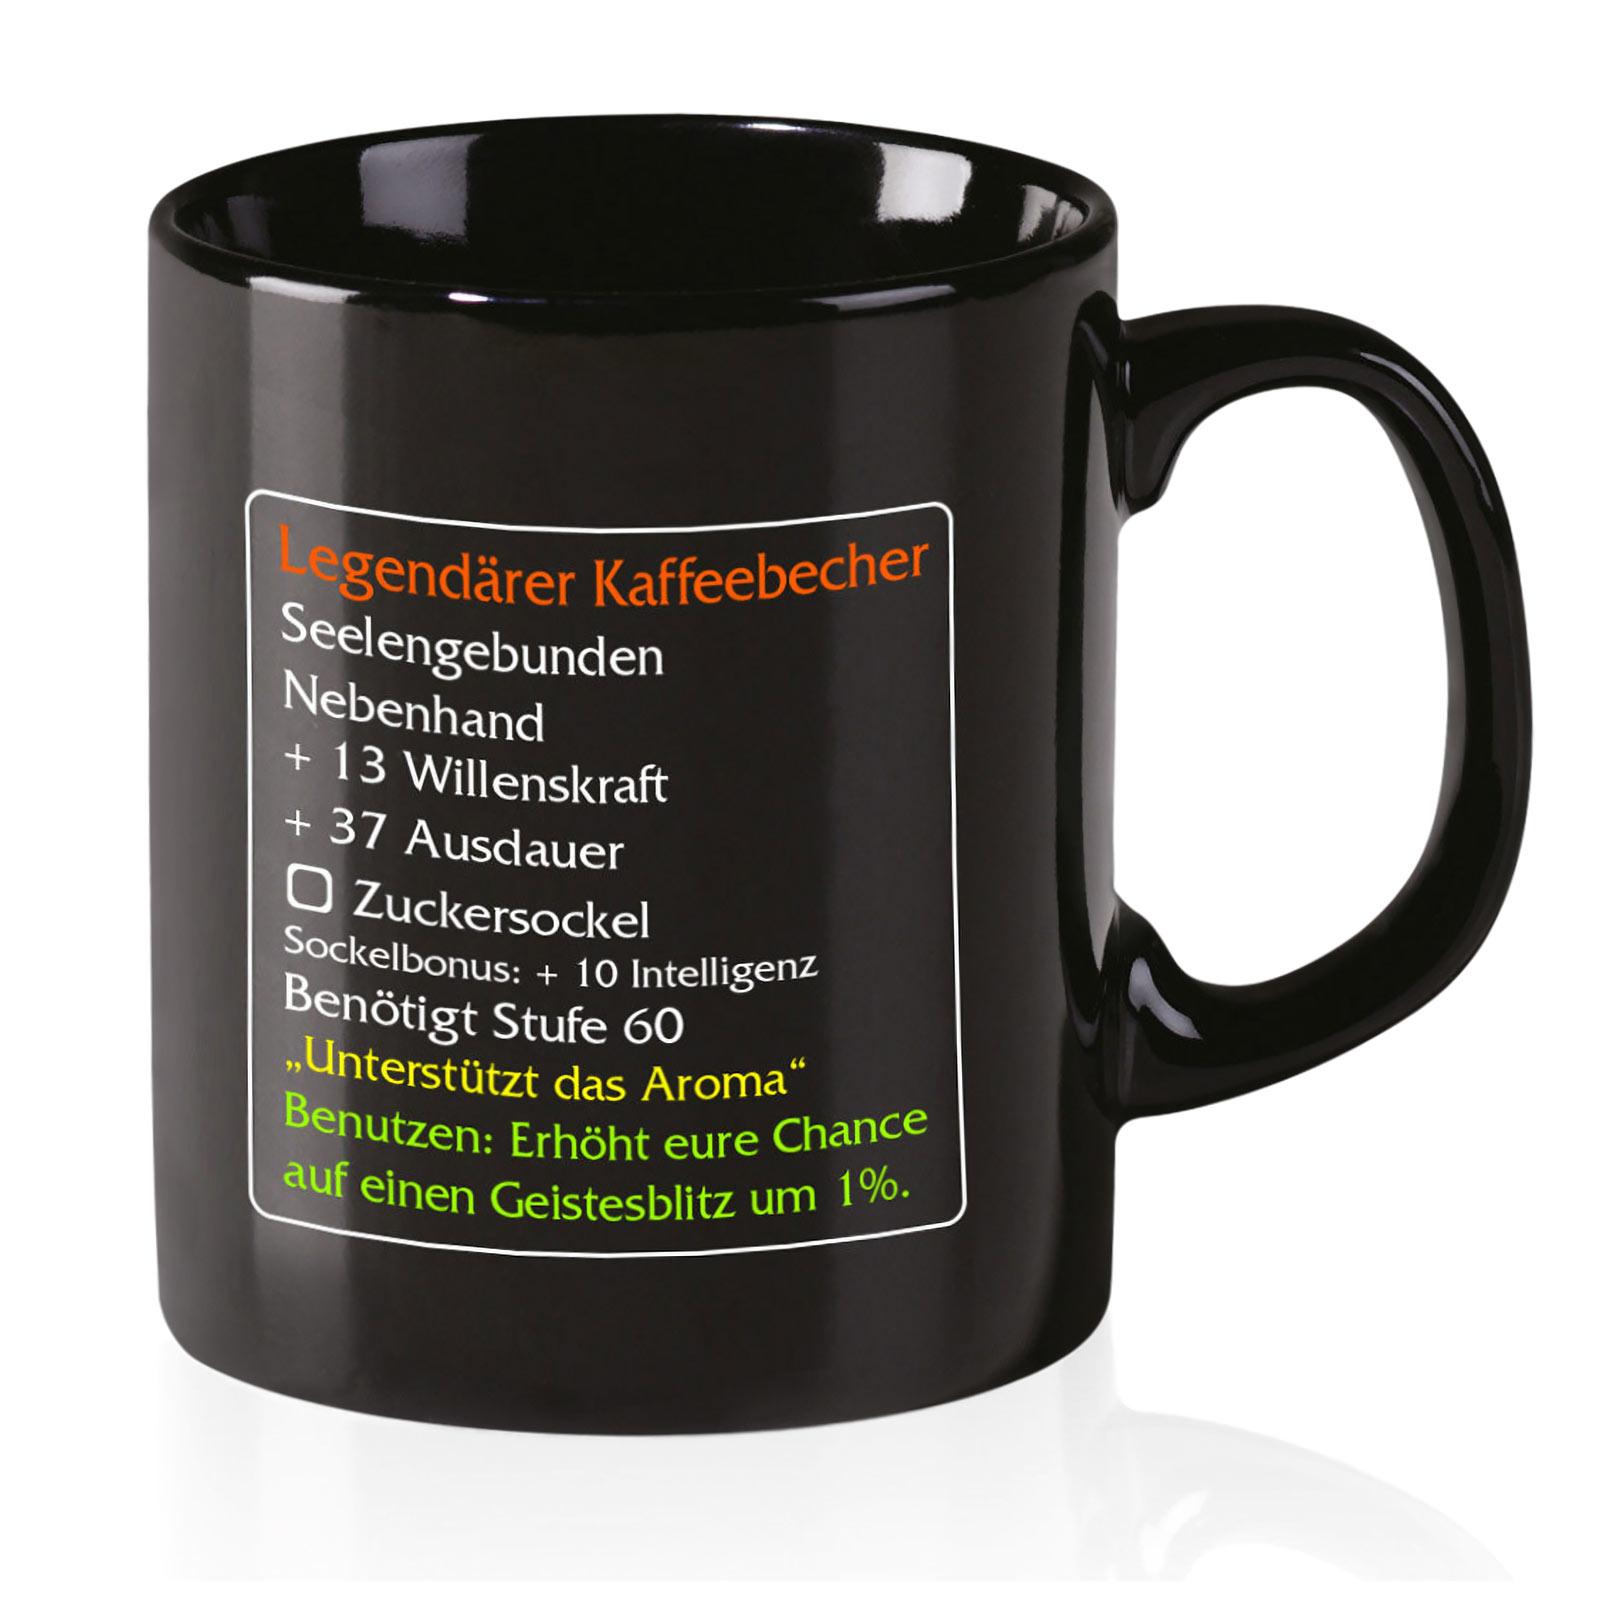 Legendärer Kaffeebecher Level 60 - MMO Item Classic Fan Tasse